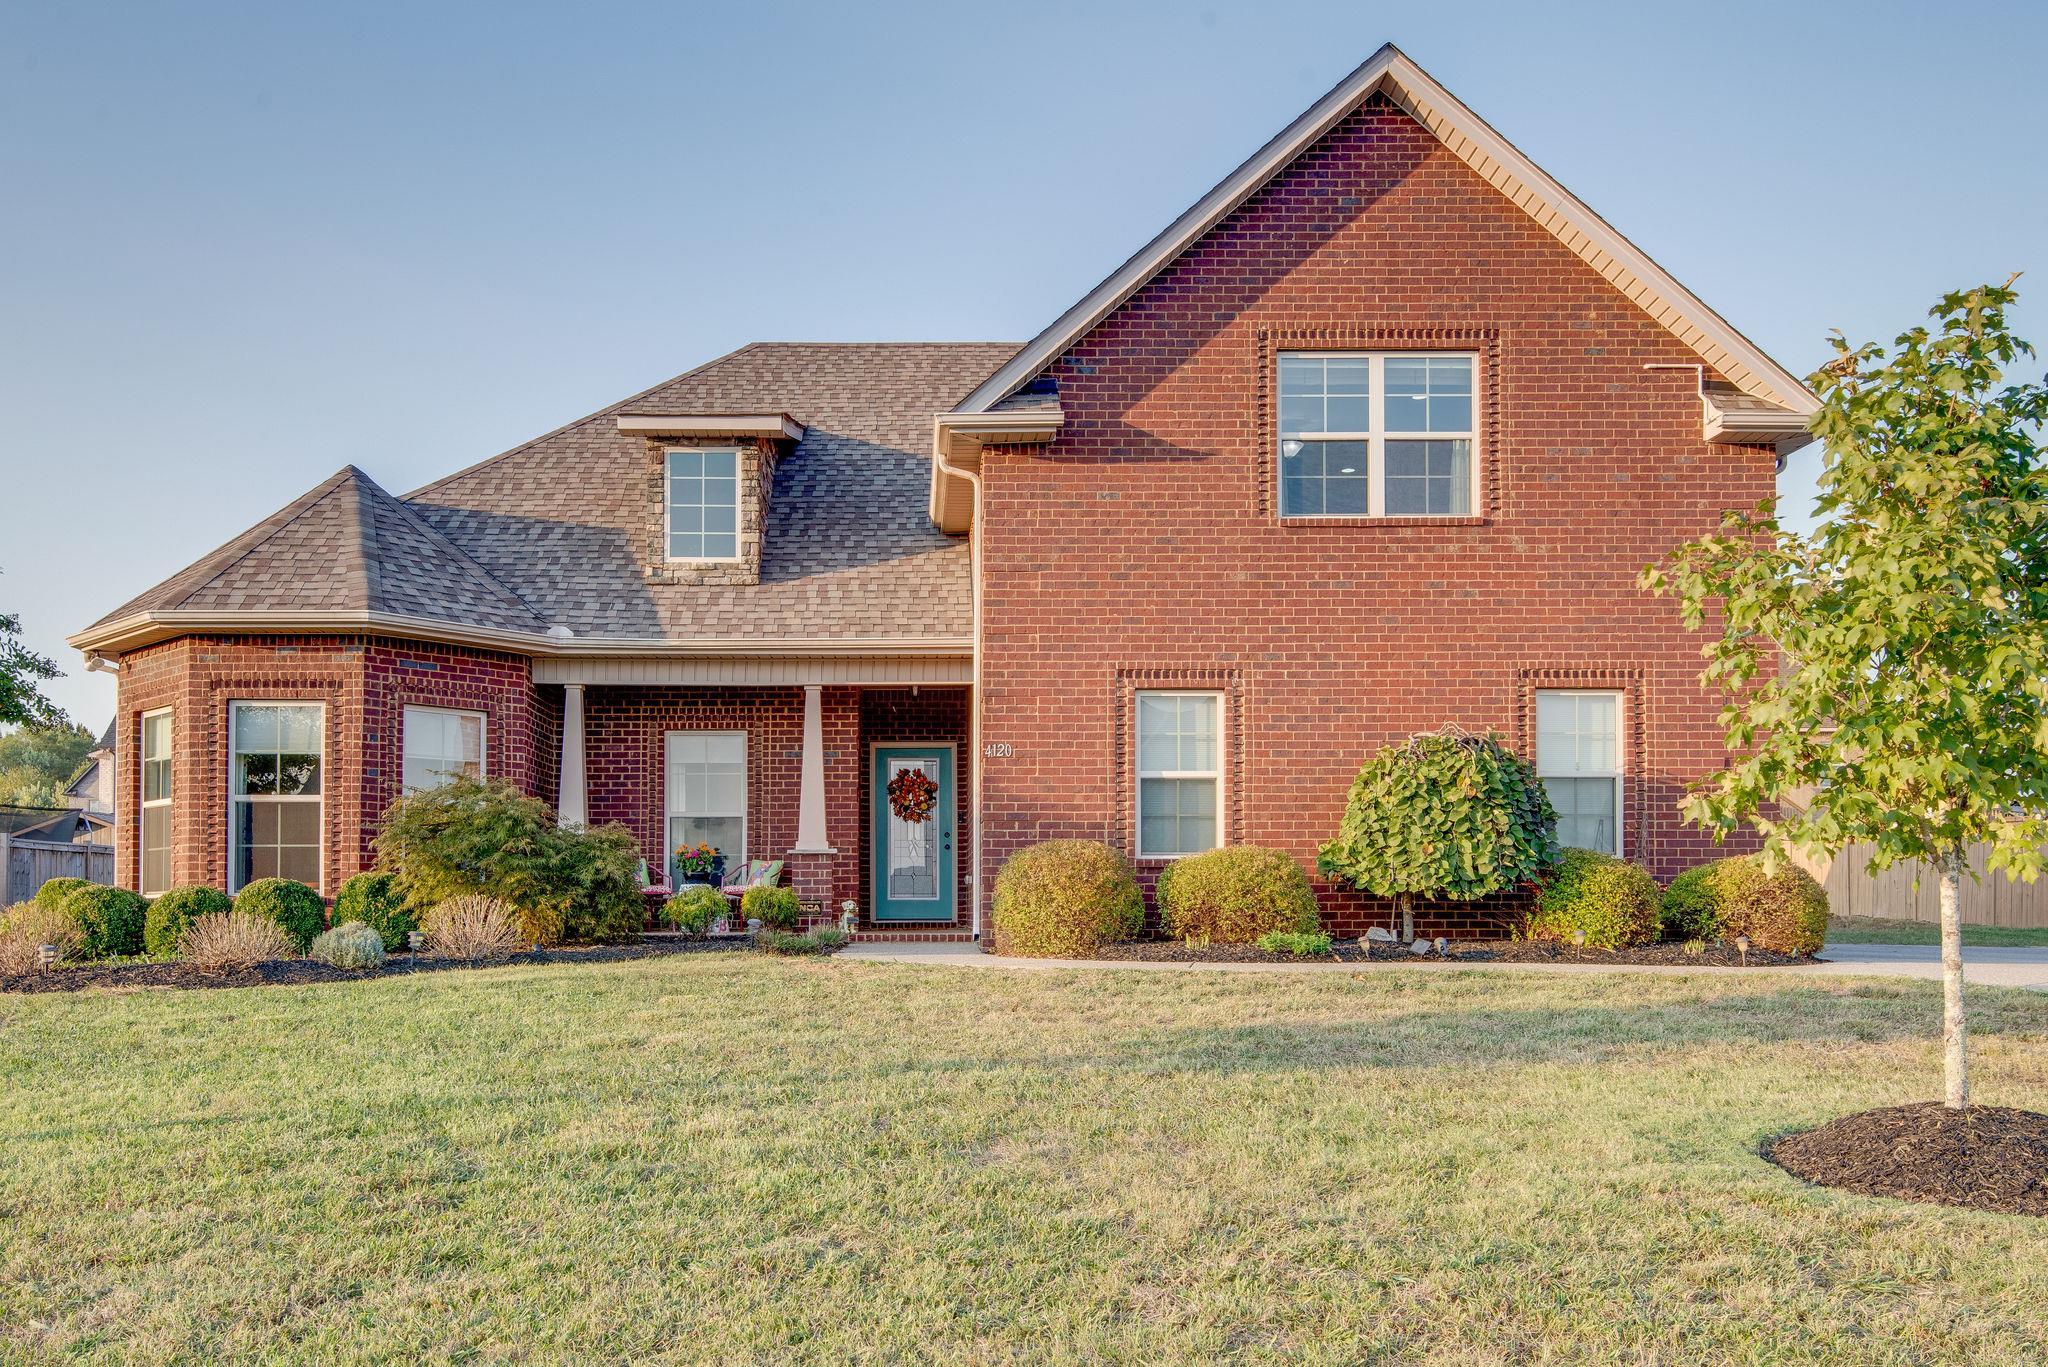 4120 Stony Point Dr, LA VERGNE, TN 37086 - LA VERGNE, TN real estate listing